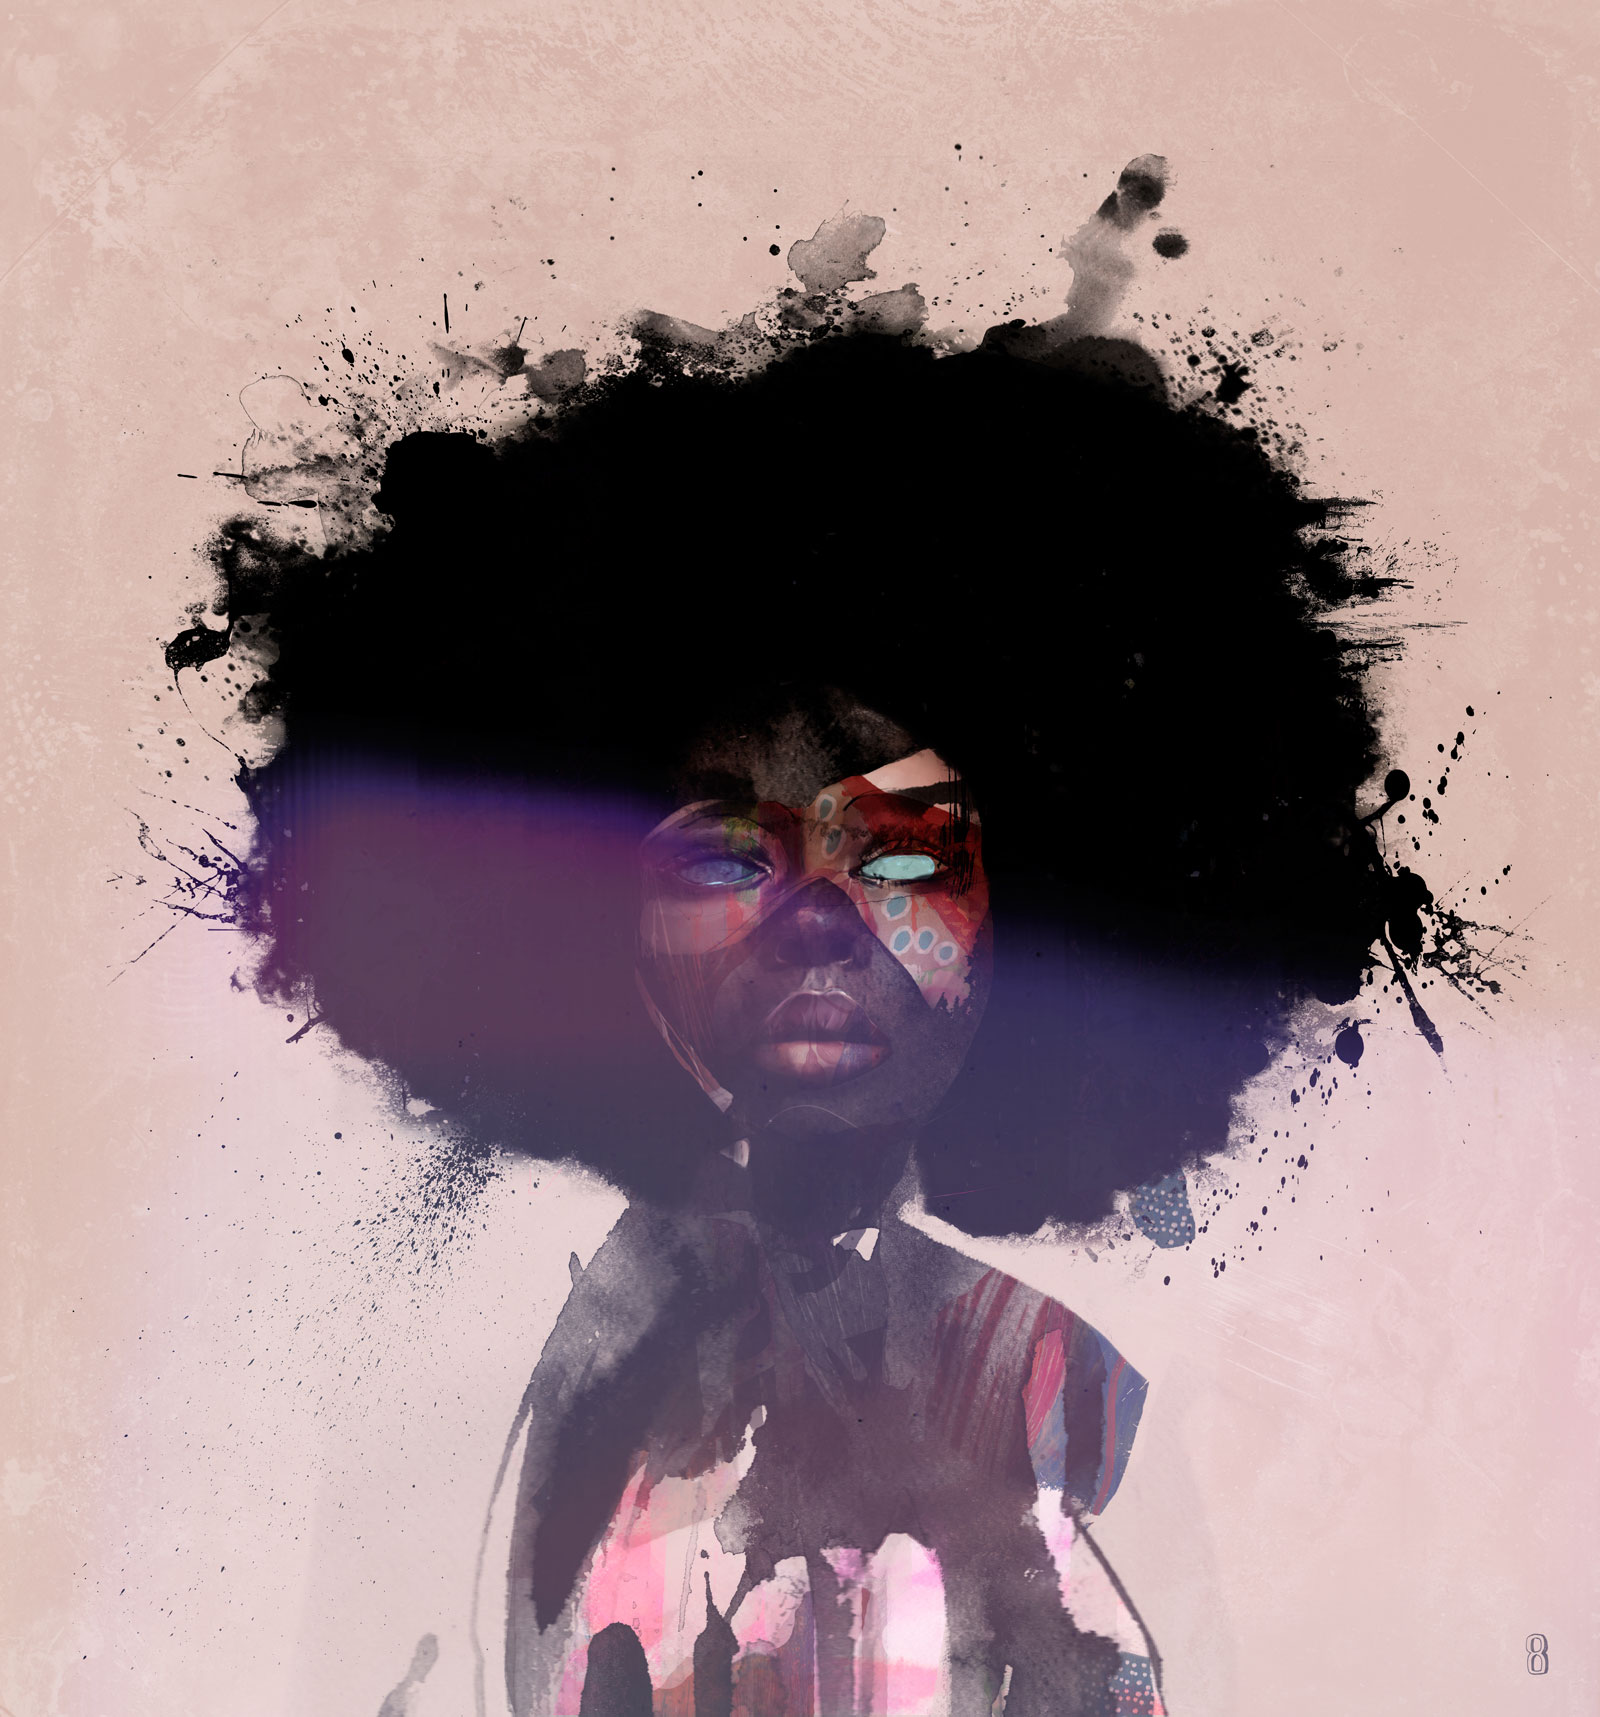 afro_funk-1600-w.jpg